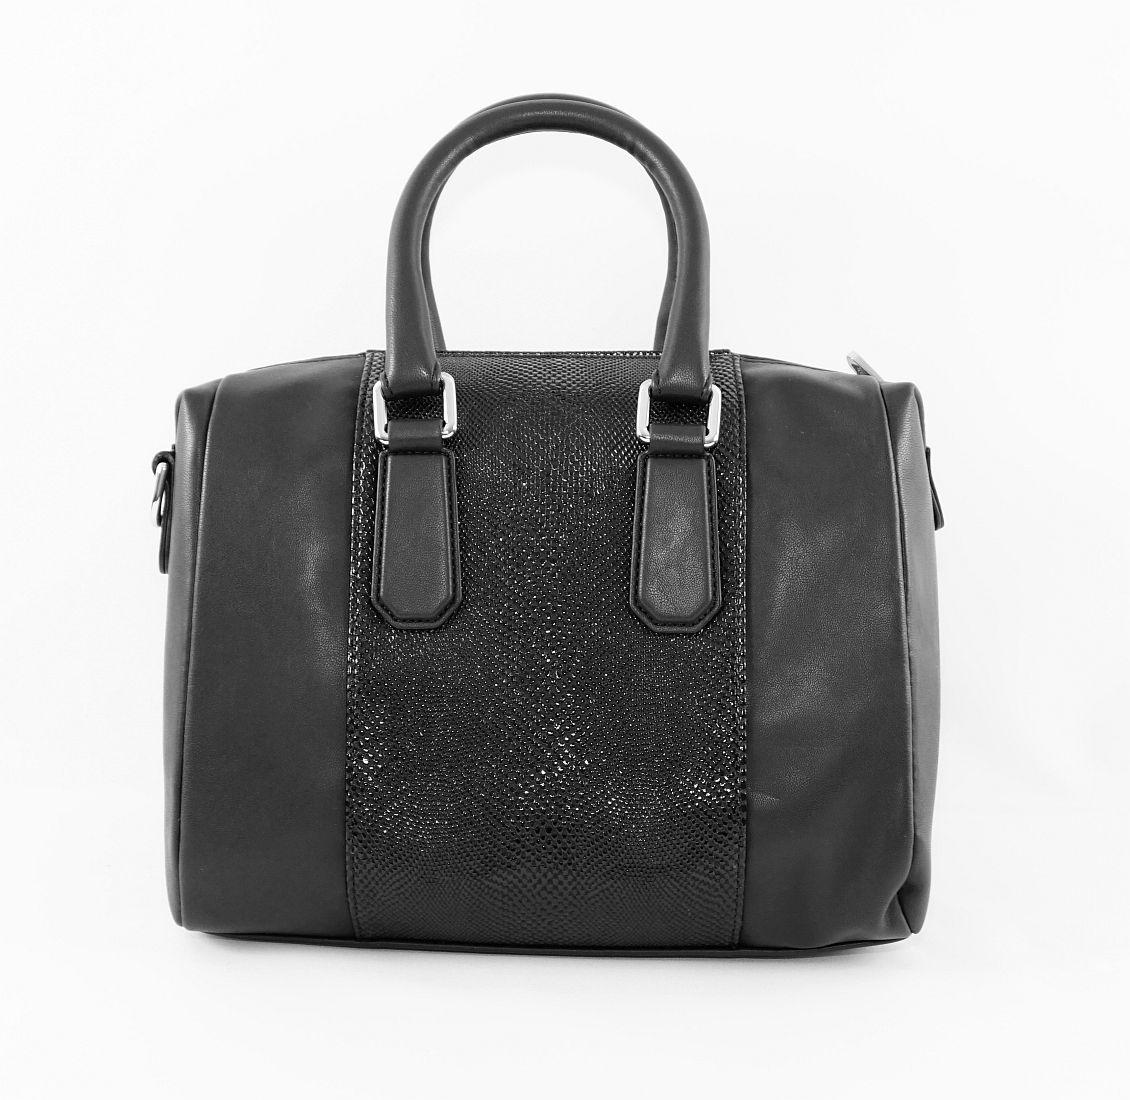 Armani Jeans Handtasche Shopper Tasche WOMEN'S BOSTON BAG 922062 6A725 00020 Nero HW16-1